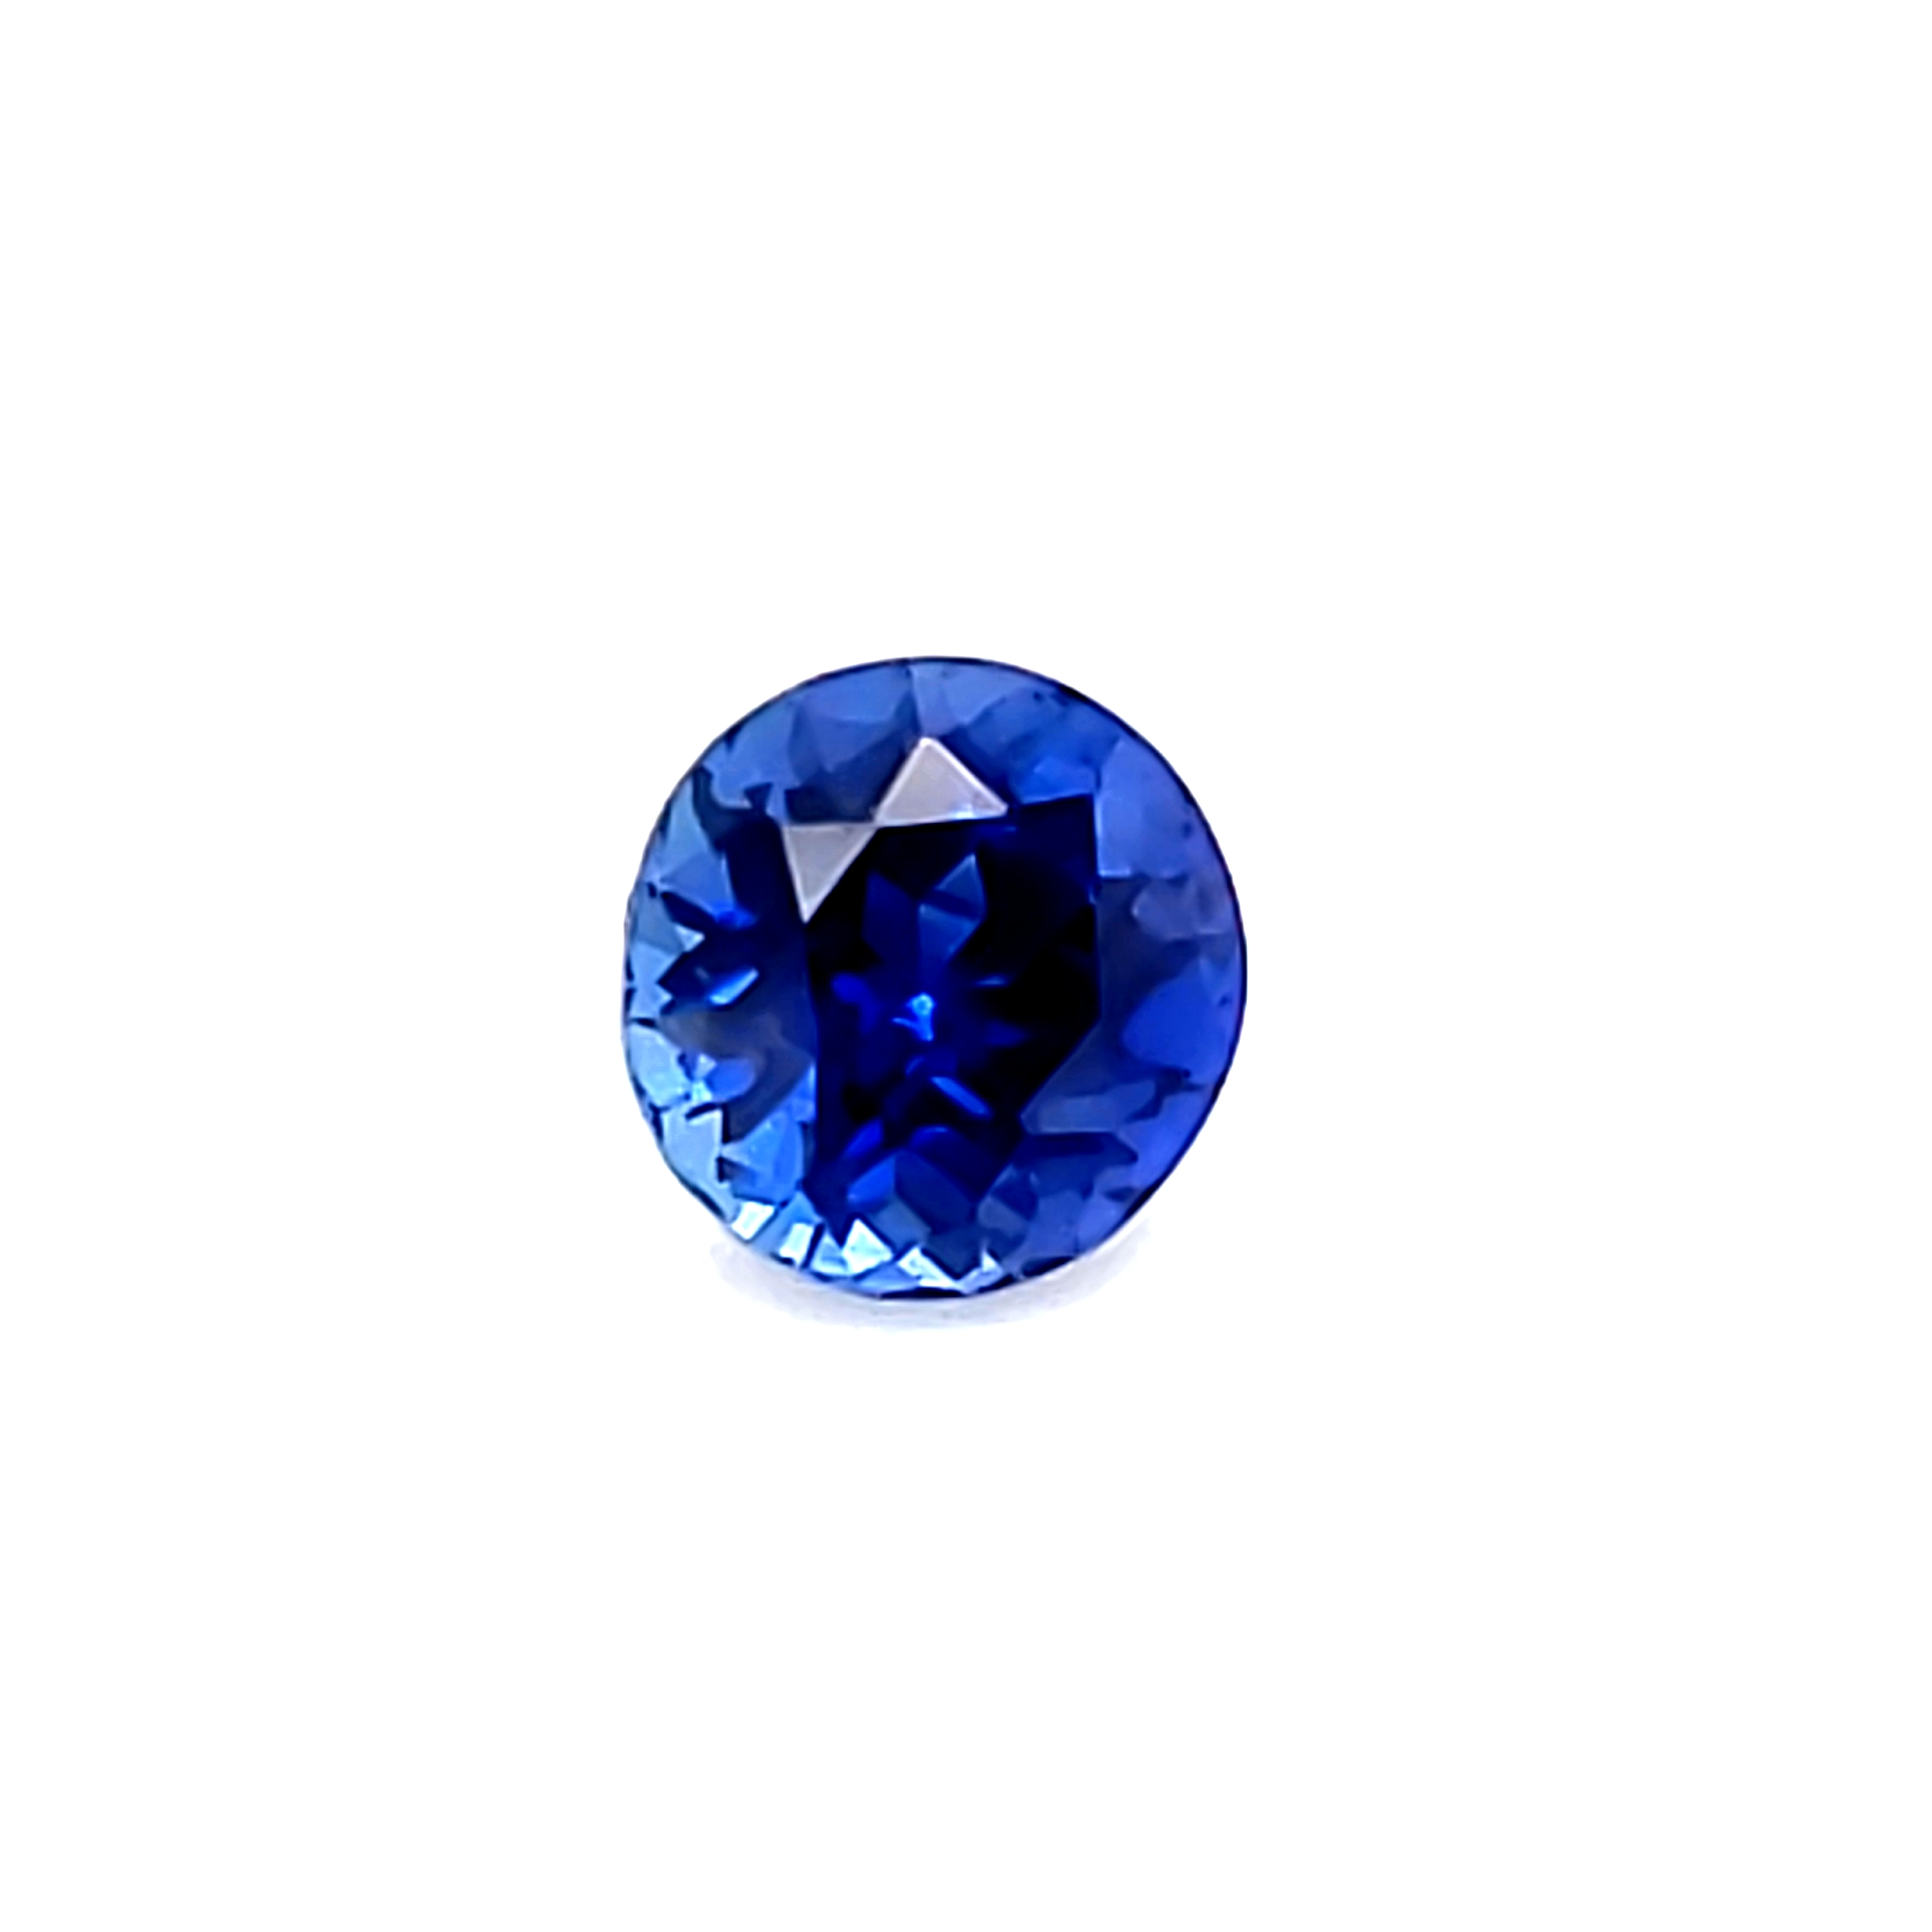 .35 ct. Sapphire